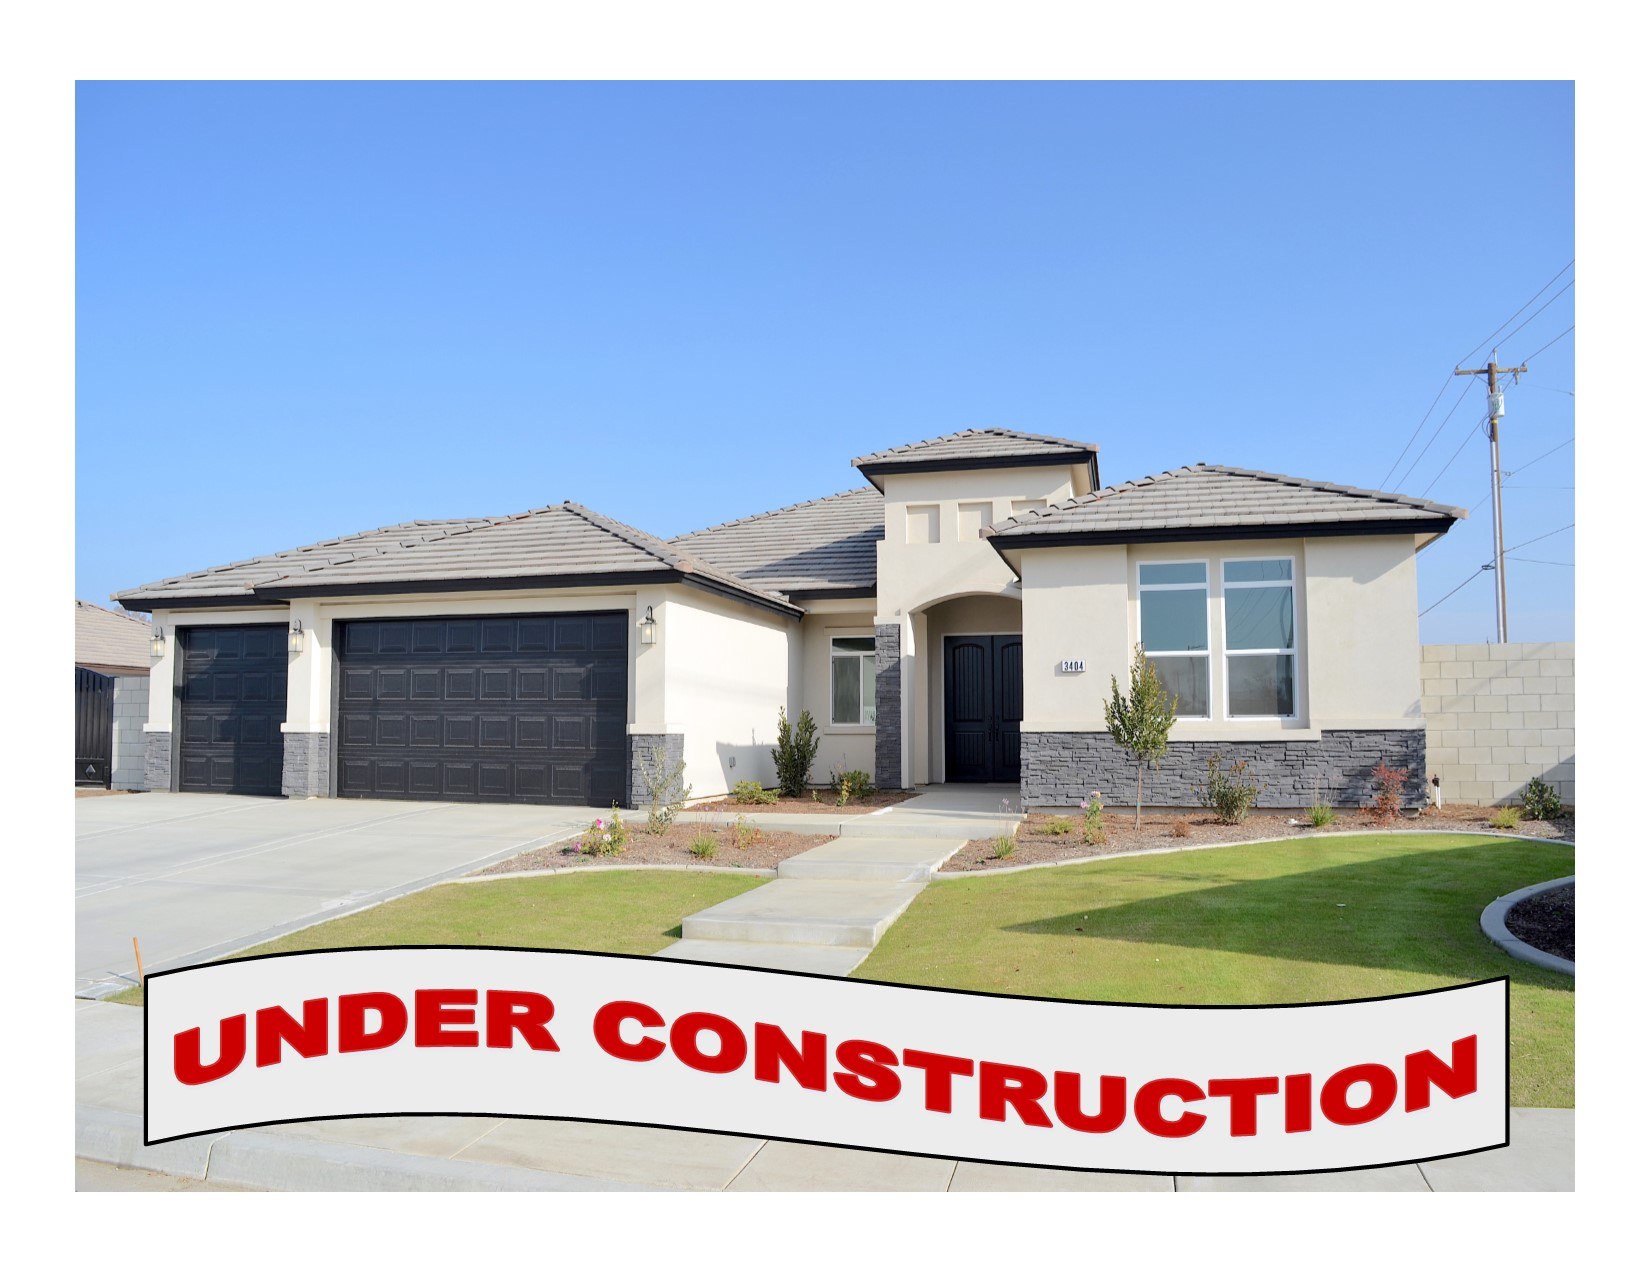 3413 Wexford Pl. - Under Construction